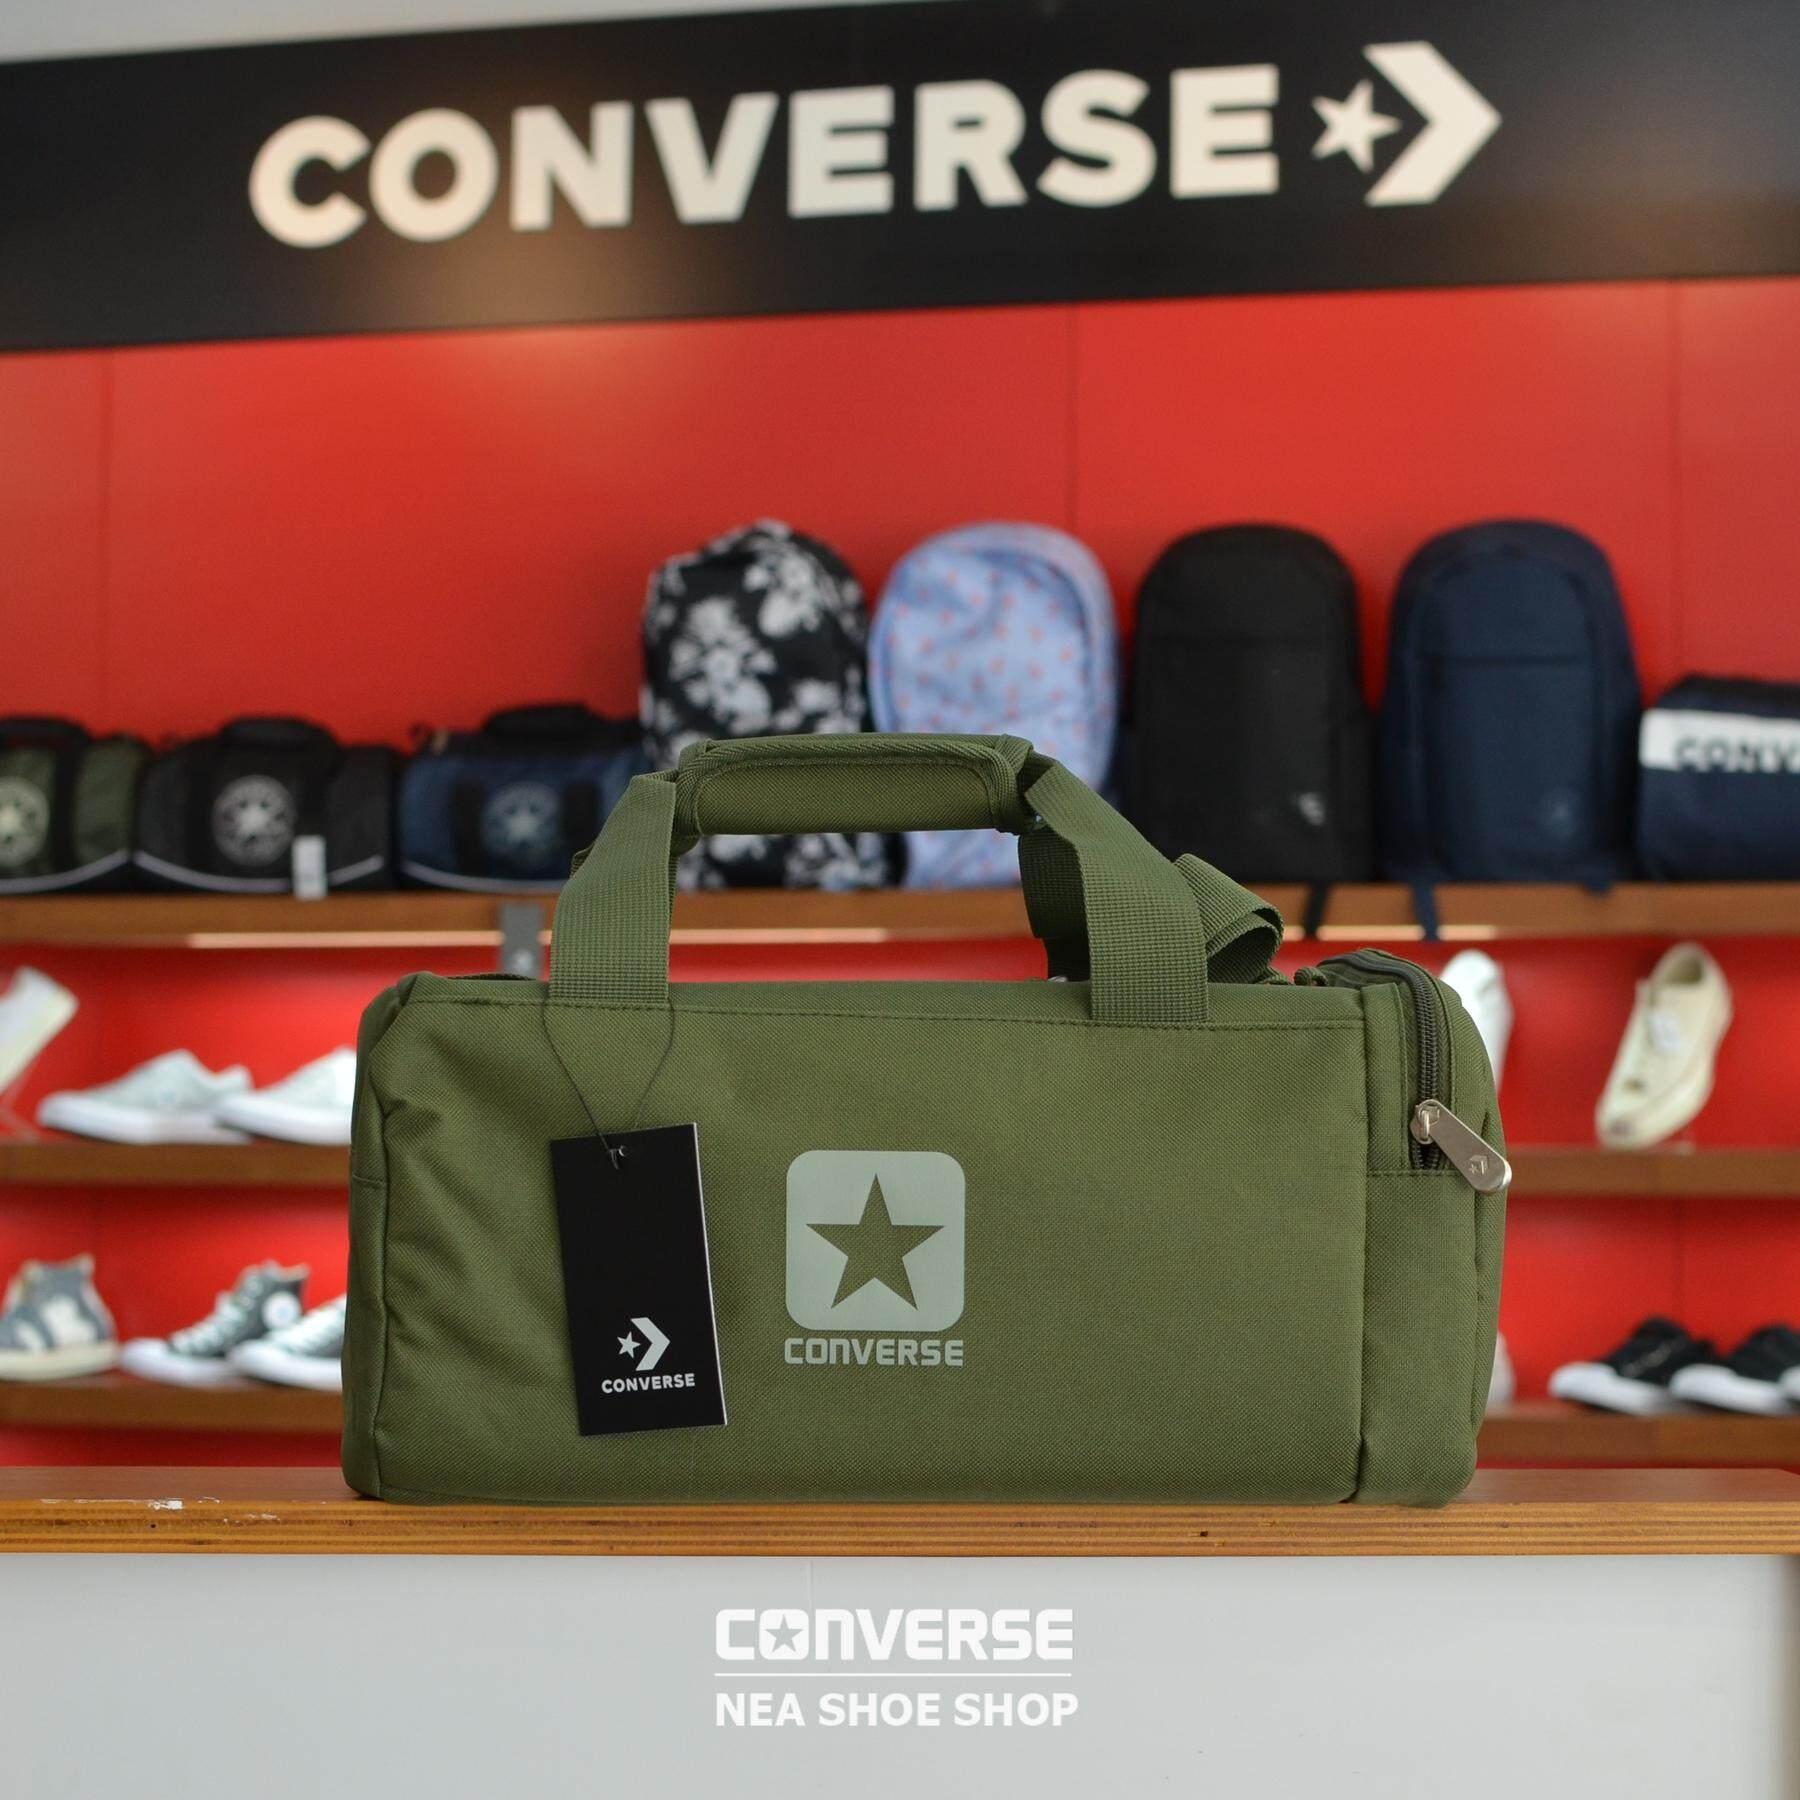 3b3edd4c86  ลิขสิทธิ์แท้  Converse SPORTY BAG สีเขียว (กระเป๋ารุ่นสุดฮิต)